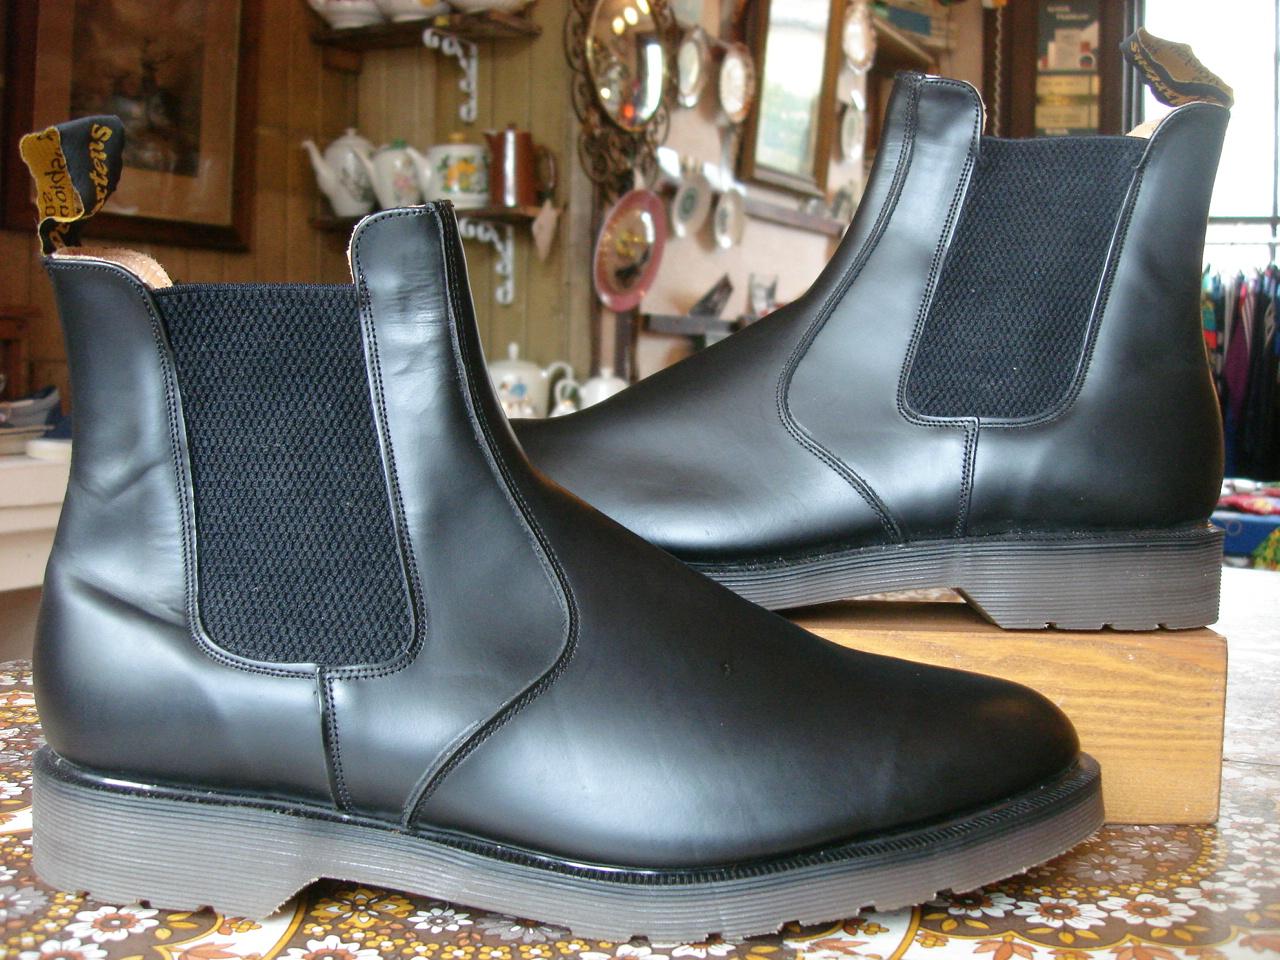 theothersideofthepillow vintage dr martens black dealer boot uk12 chelsea boot made in england. Black Bedroom Furniture Sets. Home Design Ideas